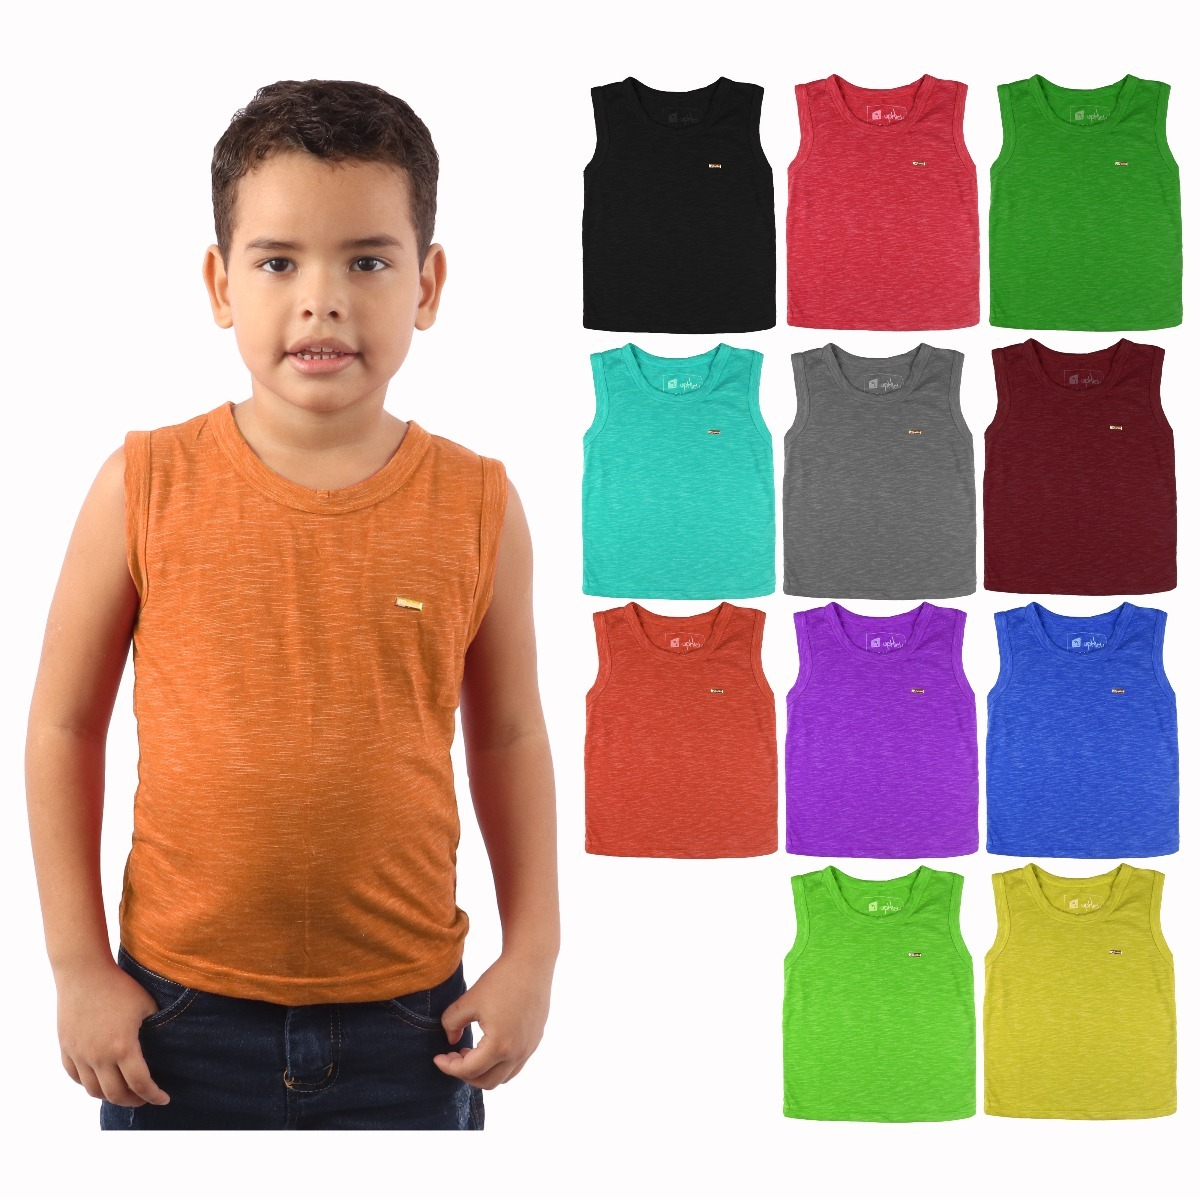 b966d48287 kit 25 camiseta regata modelo kids praia menino algodão luxo. Carregando  zoom.